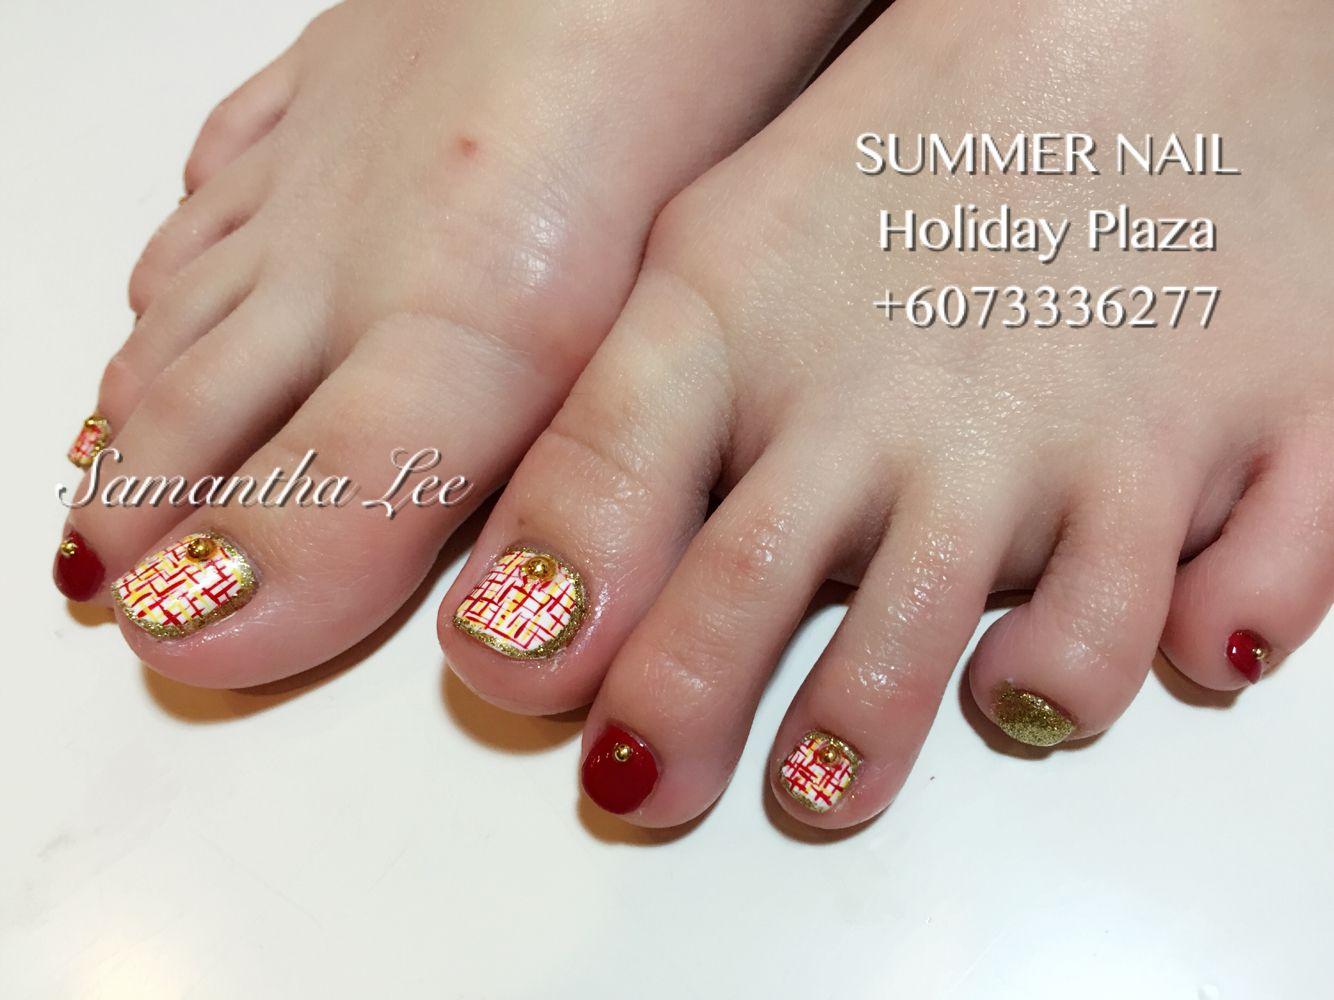 Summer Nail Holiday Plaza Mcdonald S Upstairs 3rd Floor 6073336277 Whatsapp 60163188359 Instagram Summ Artificial Nails Gel Pedicure Gel Manicure